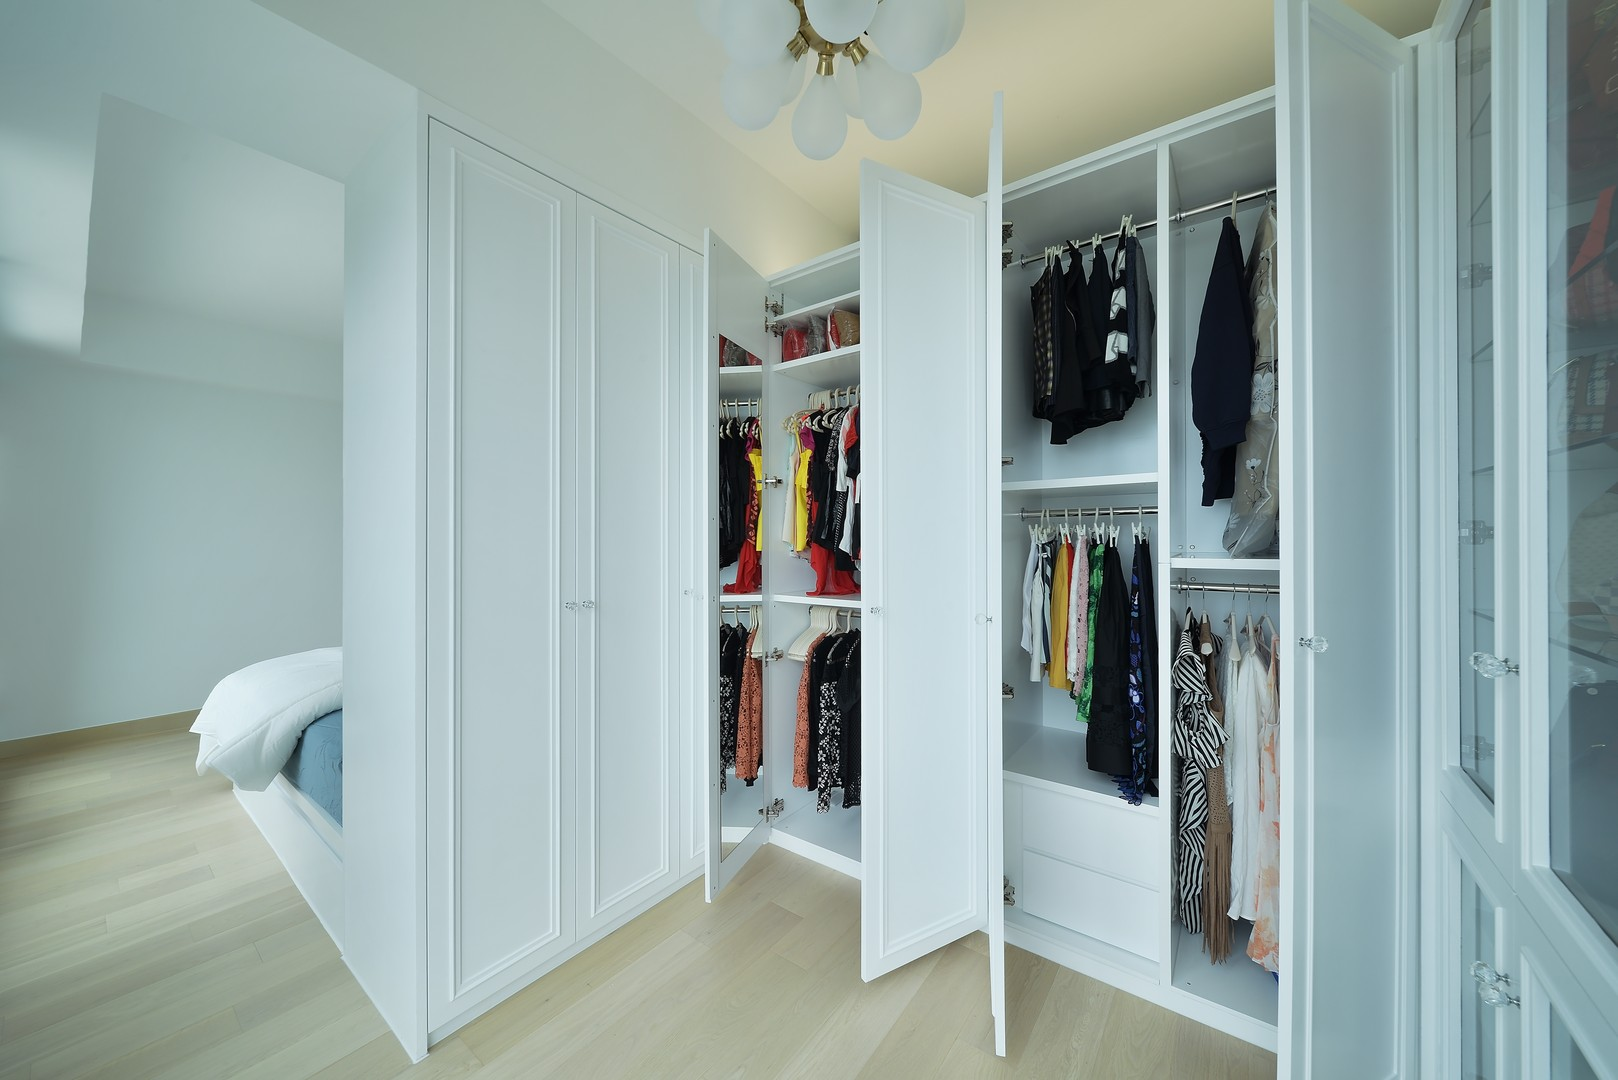 Inch Interior Design Hong Kong - The Capri 004